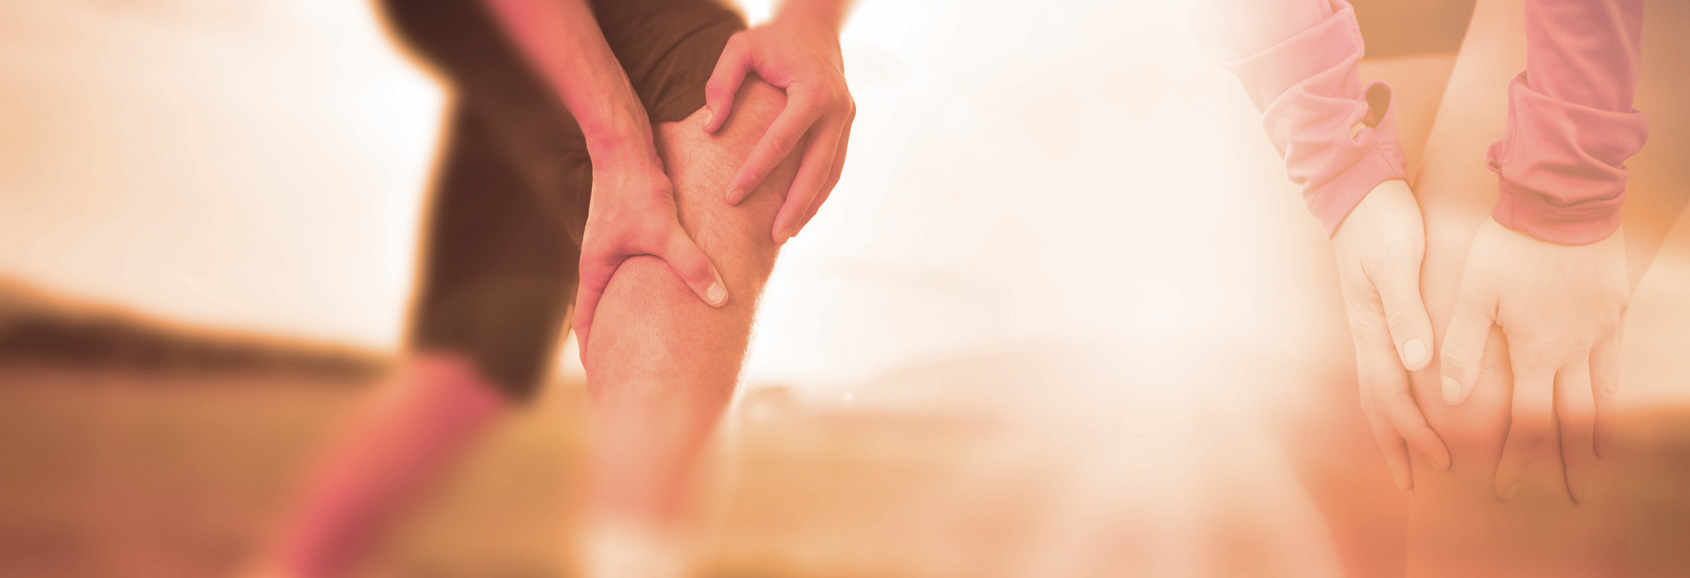 sports massage cheltenham gloucestershire annie white